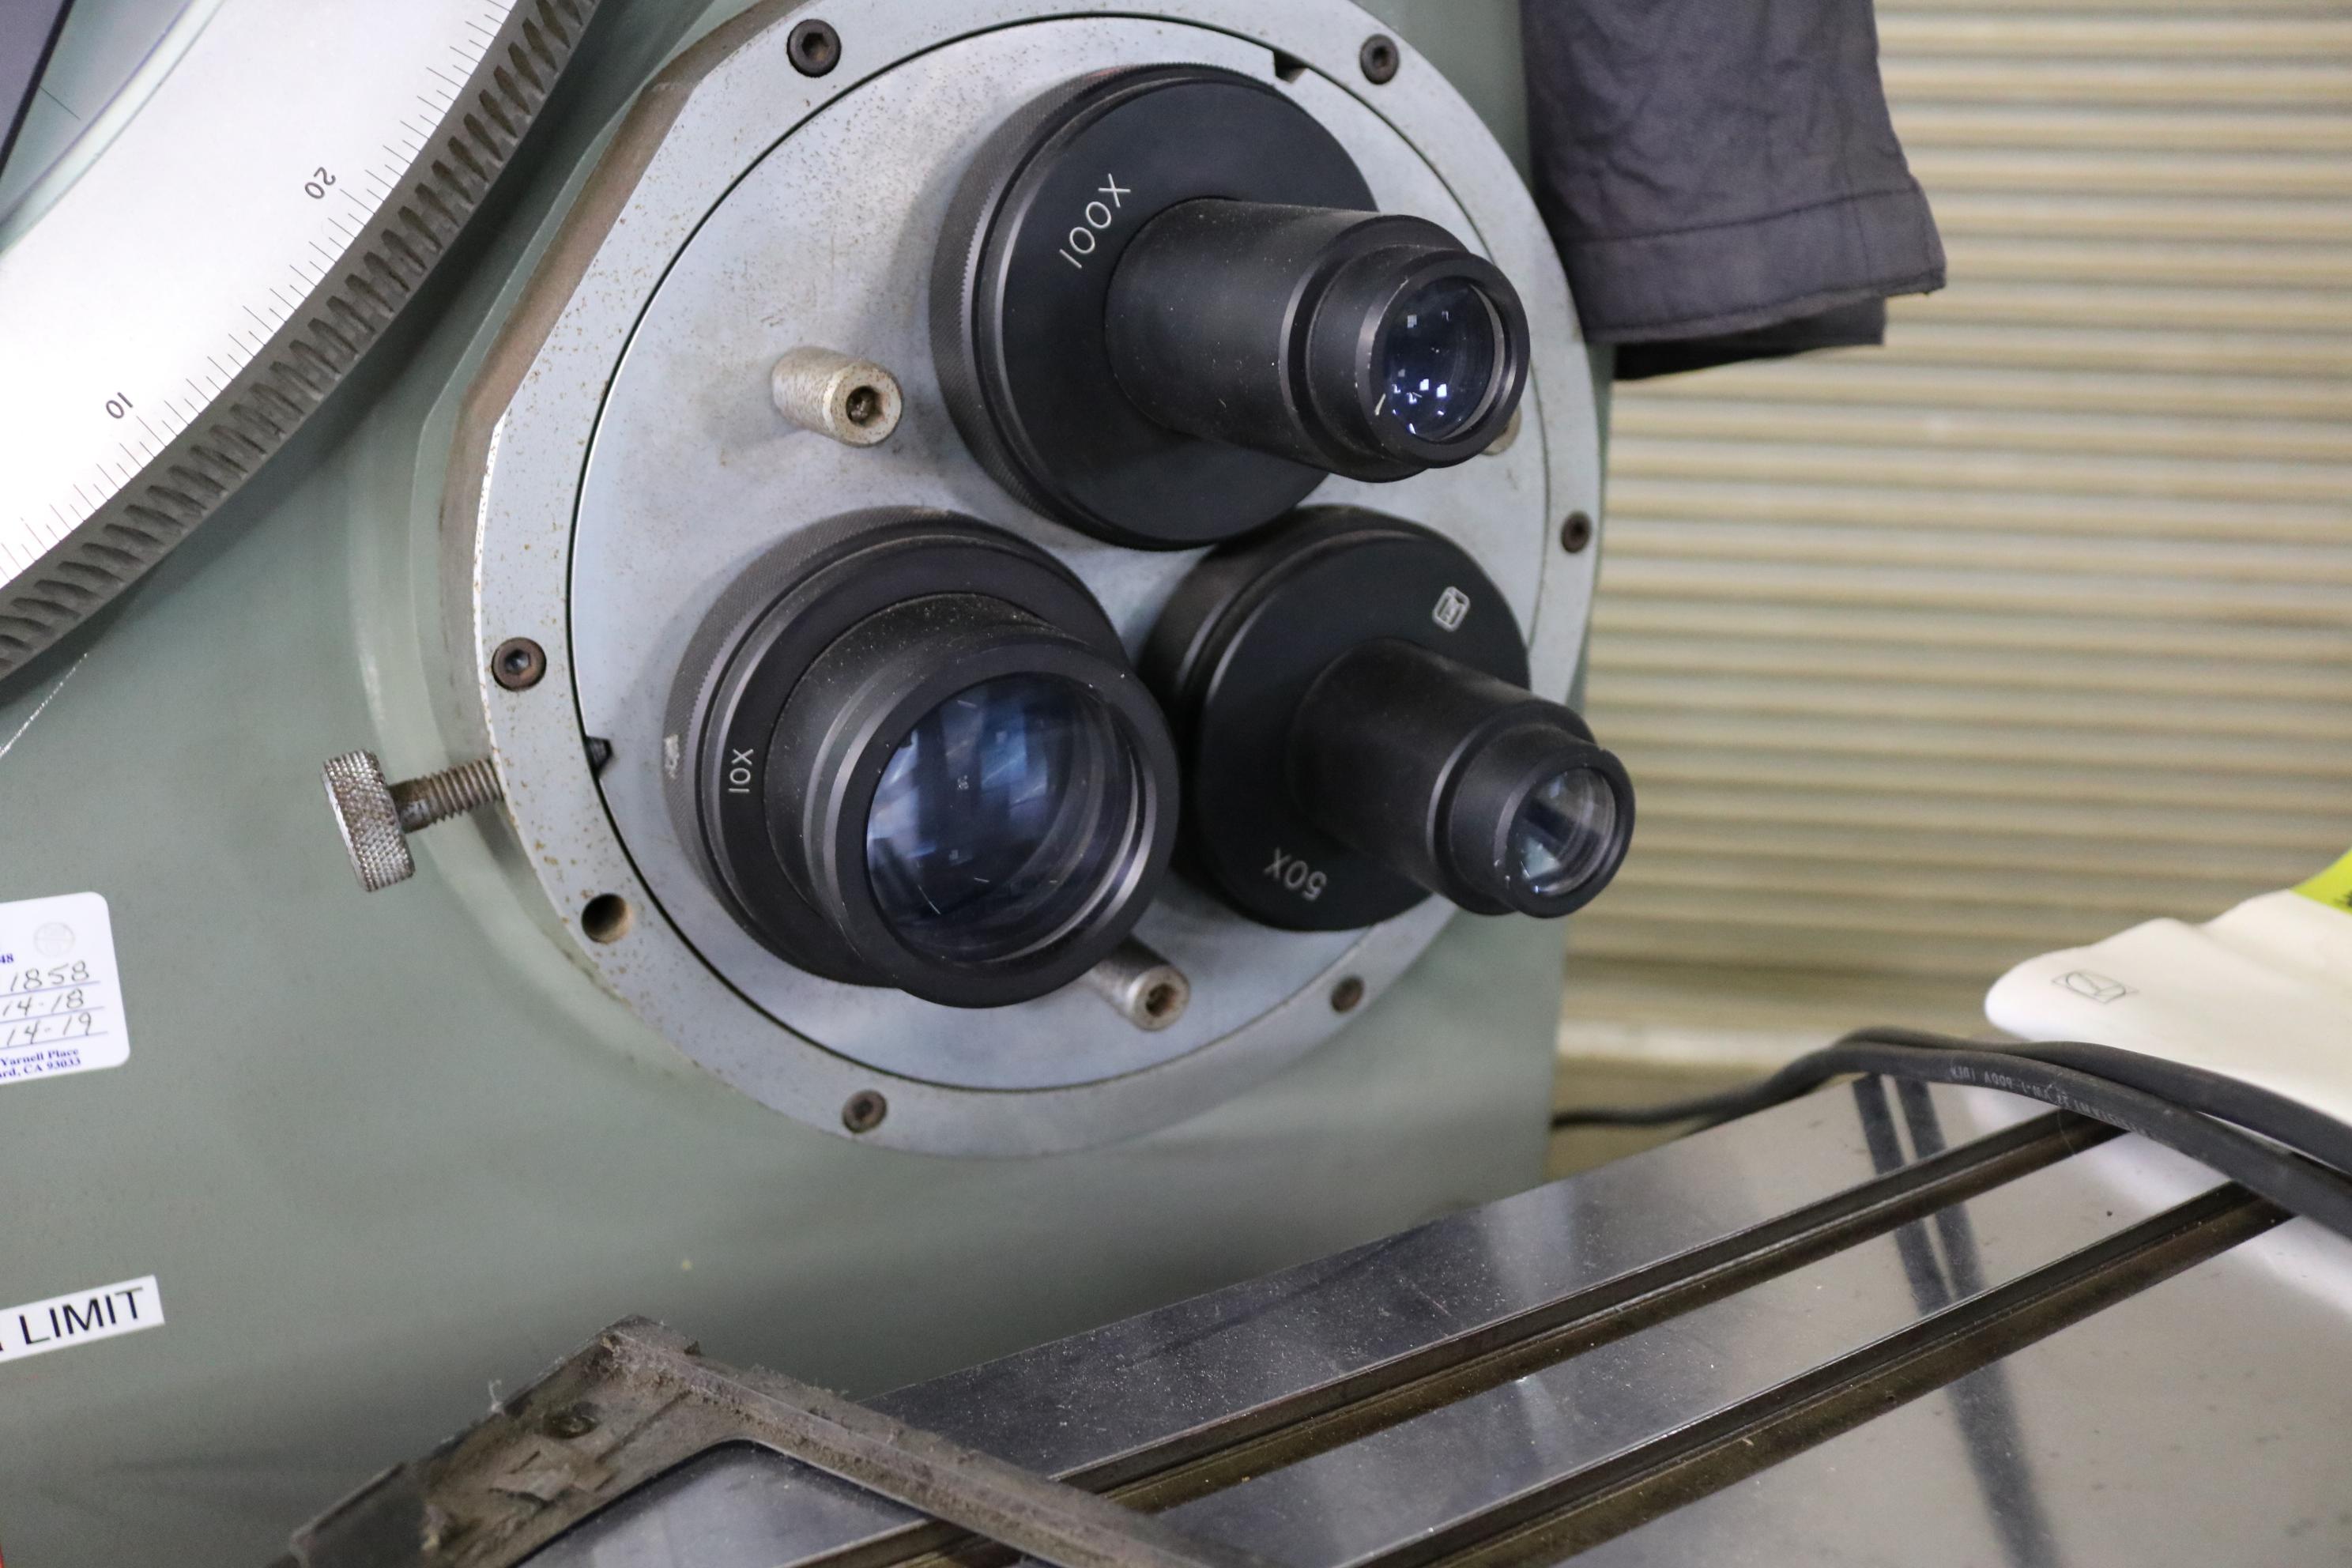 Lot 15 - JONES & LAMPSON OPTICAL COMPARATOR MEASURING MACHINE, MODEL CLASSIC 120, HEIDENHAIN QUADRA-CHECK